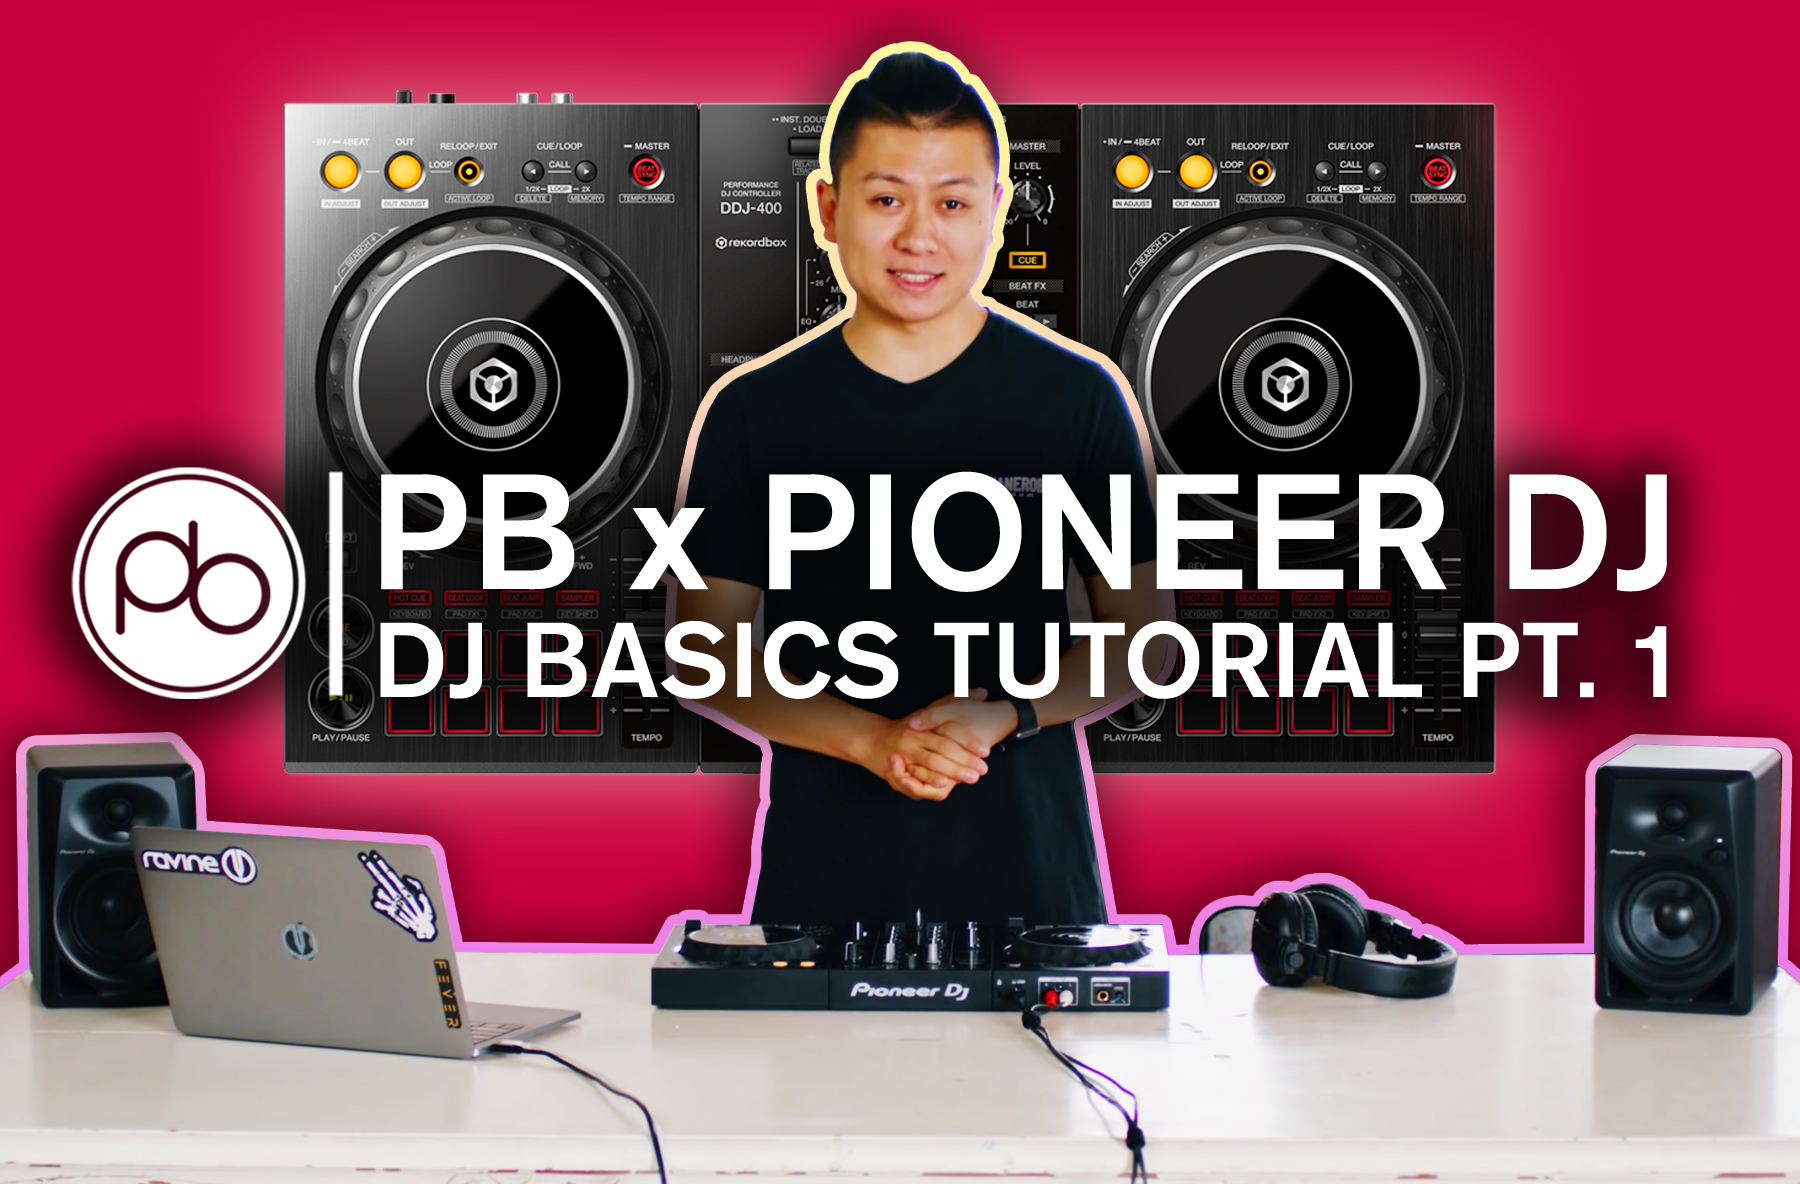 Watch Point Blank's DDJ-400 Basics Tutorial